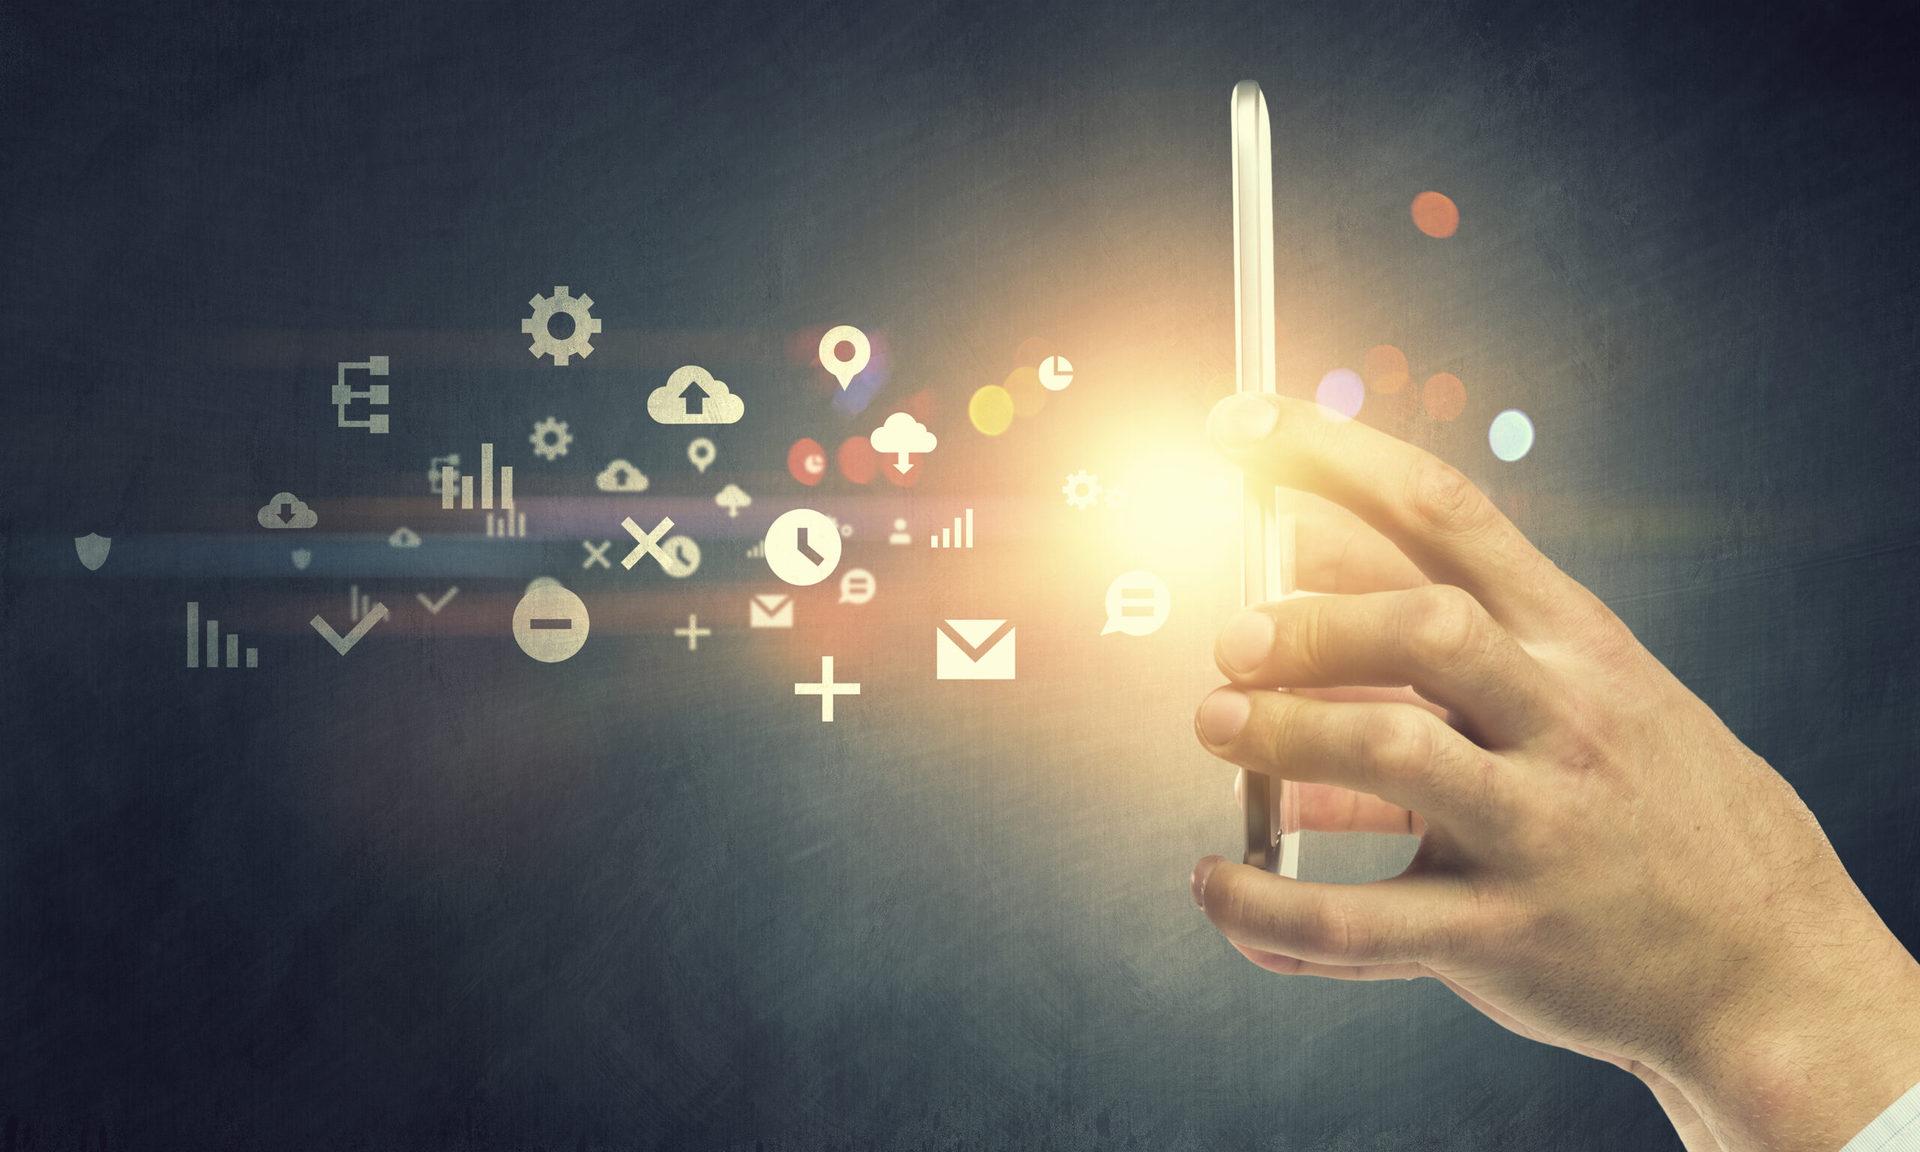 Social media and cloud computing . Mixed media